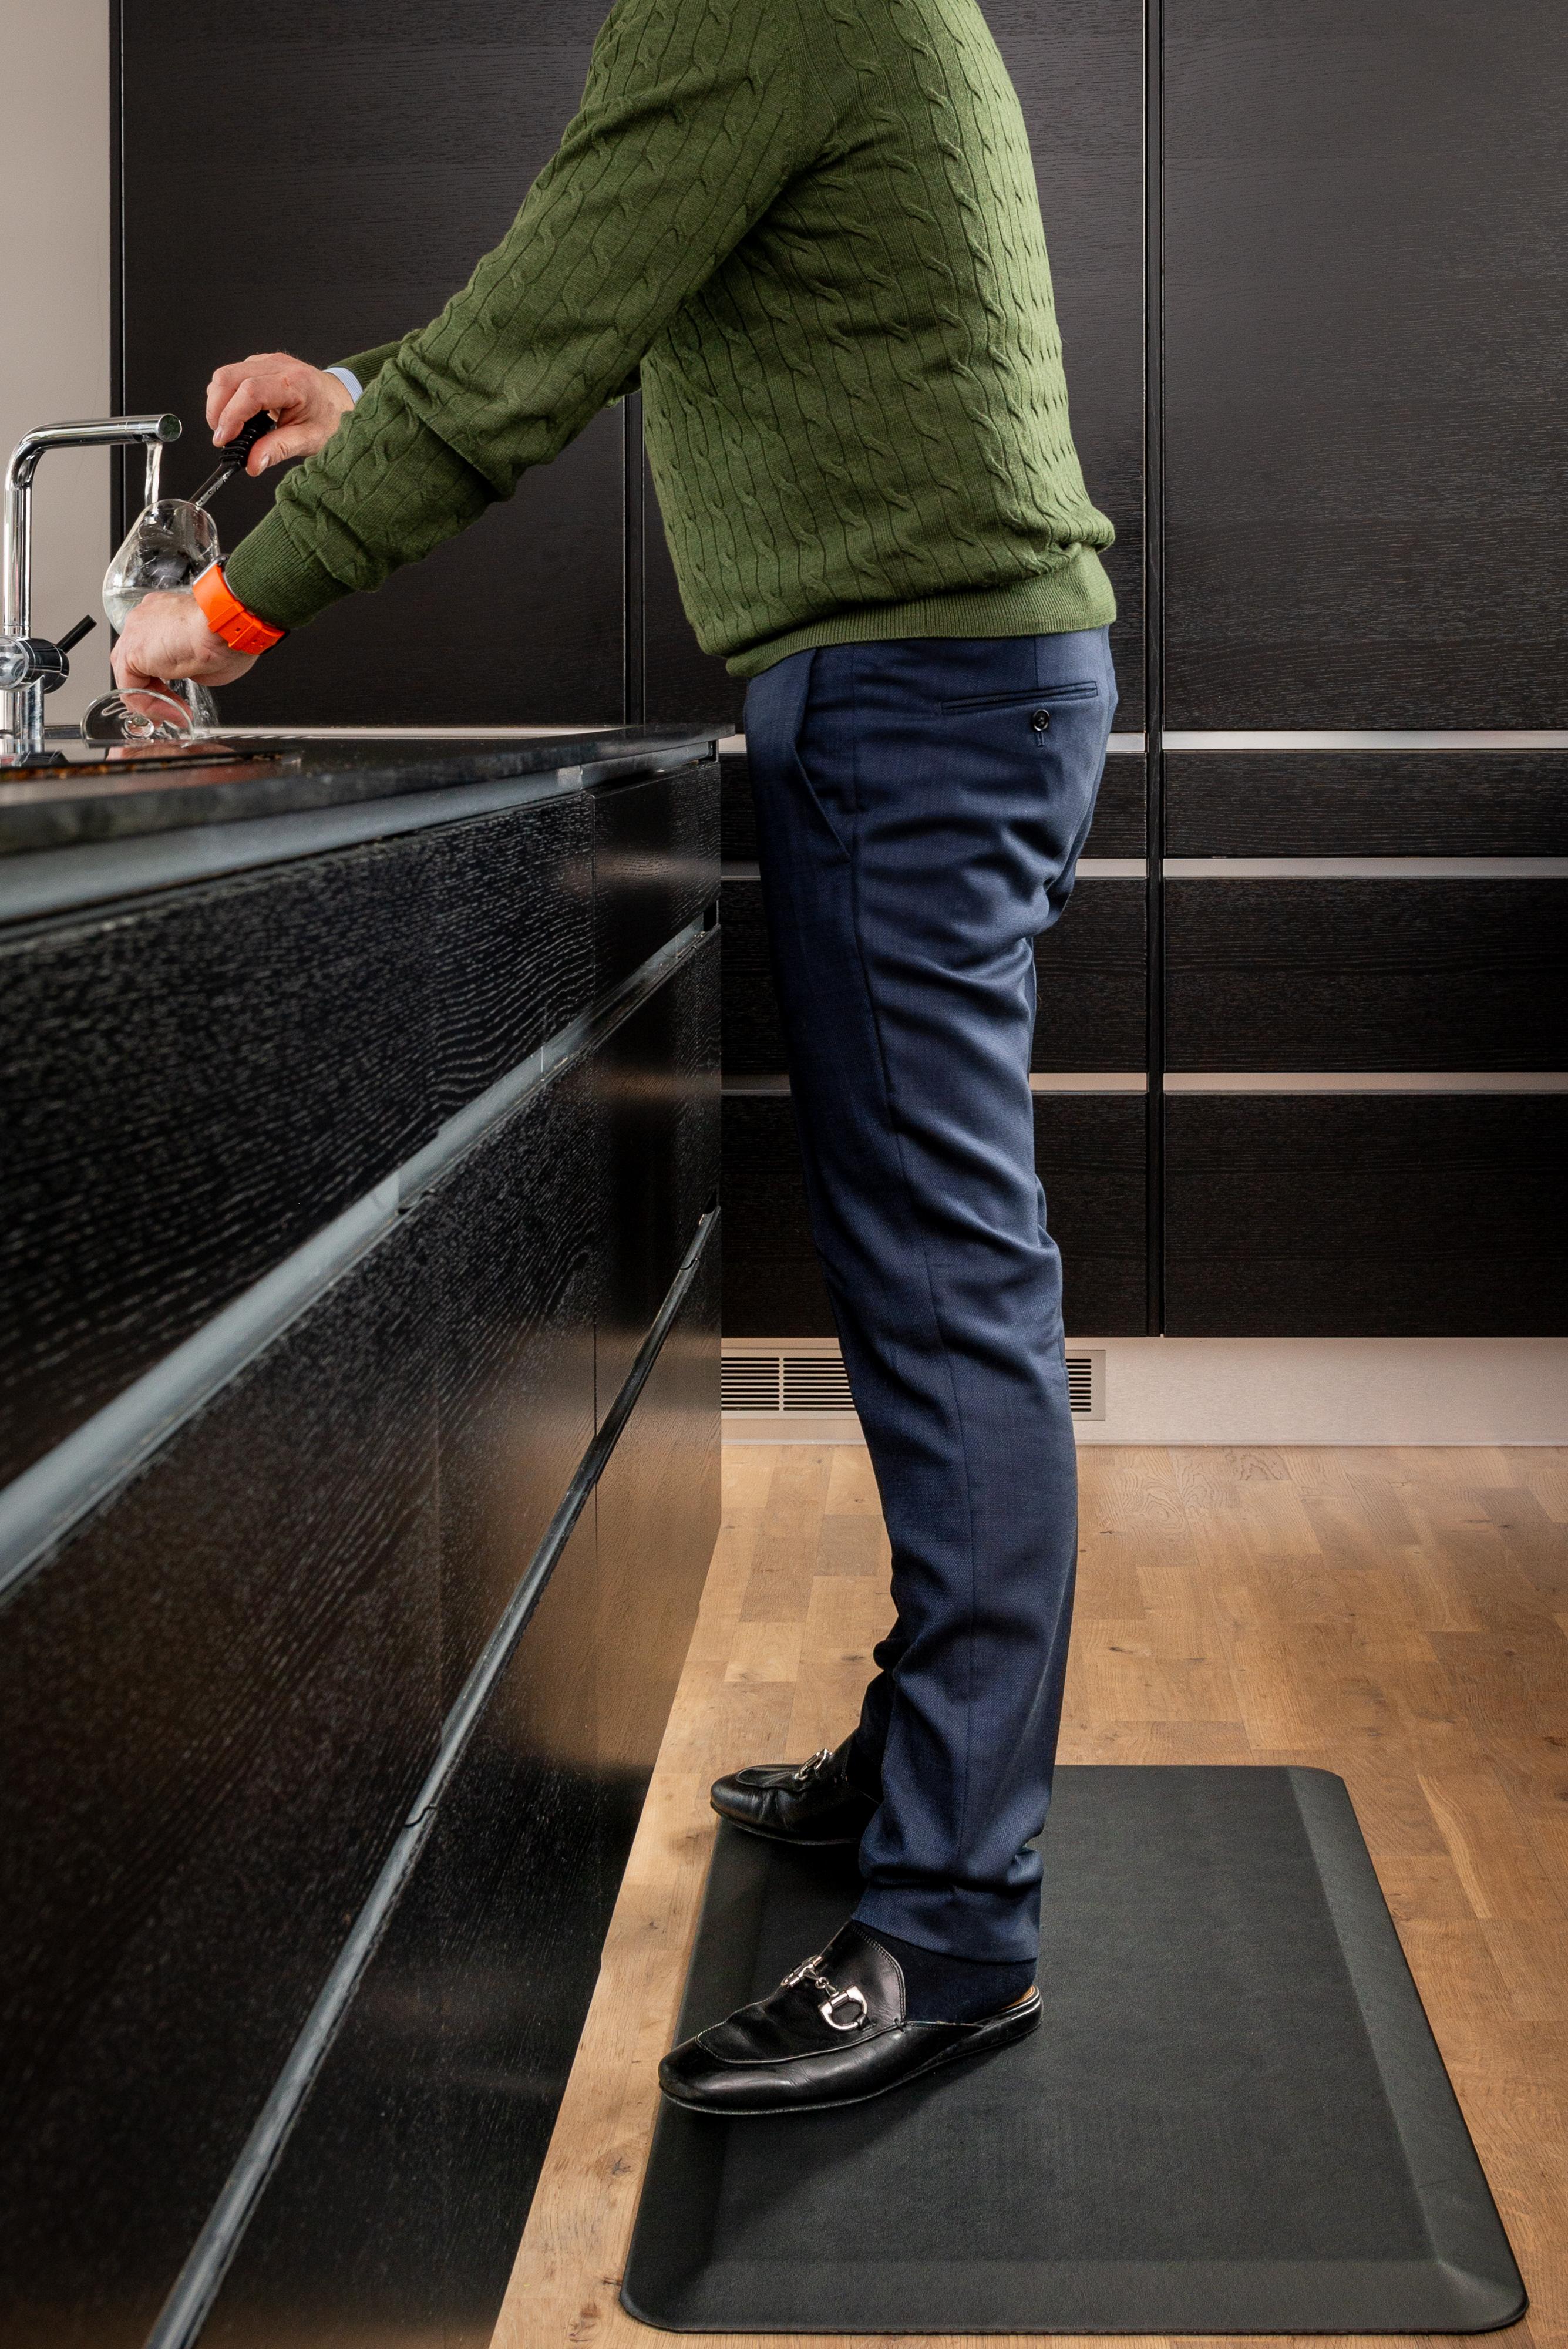 Home-Step Ergonomiskmatta i Polyuretan svart 51x76cm